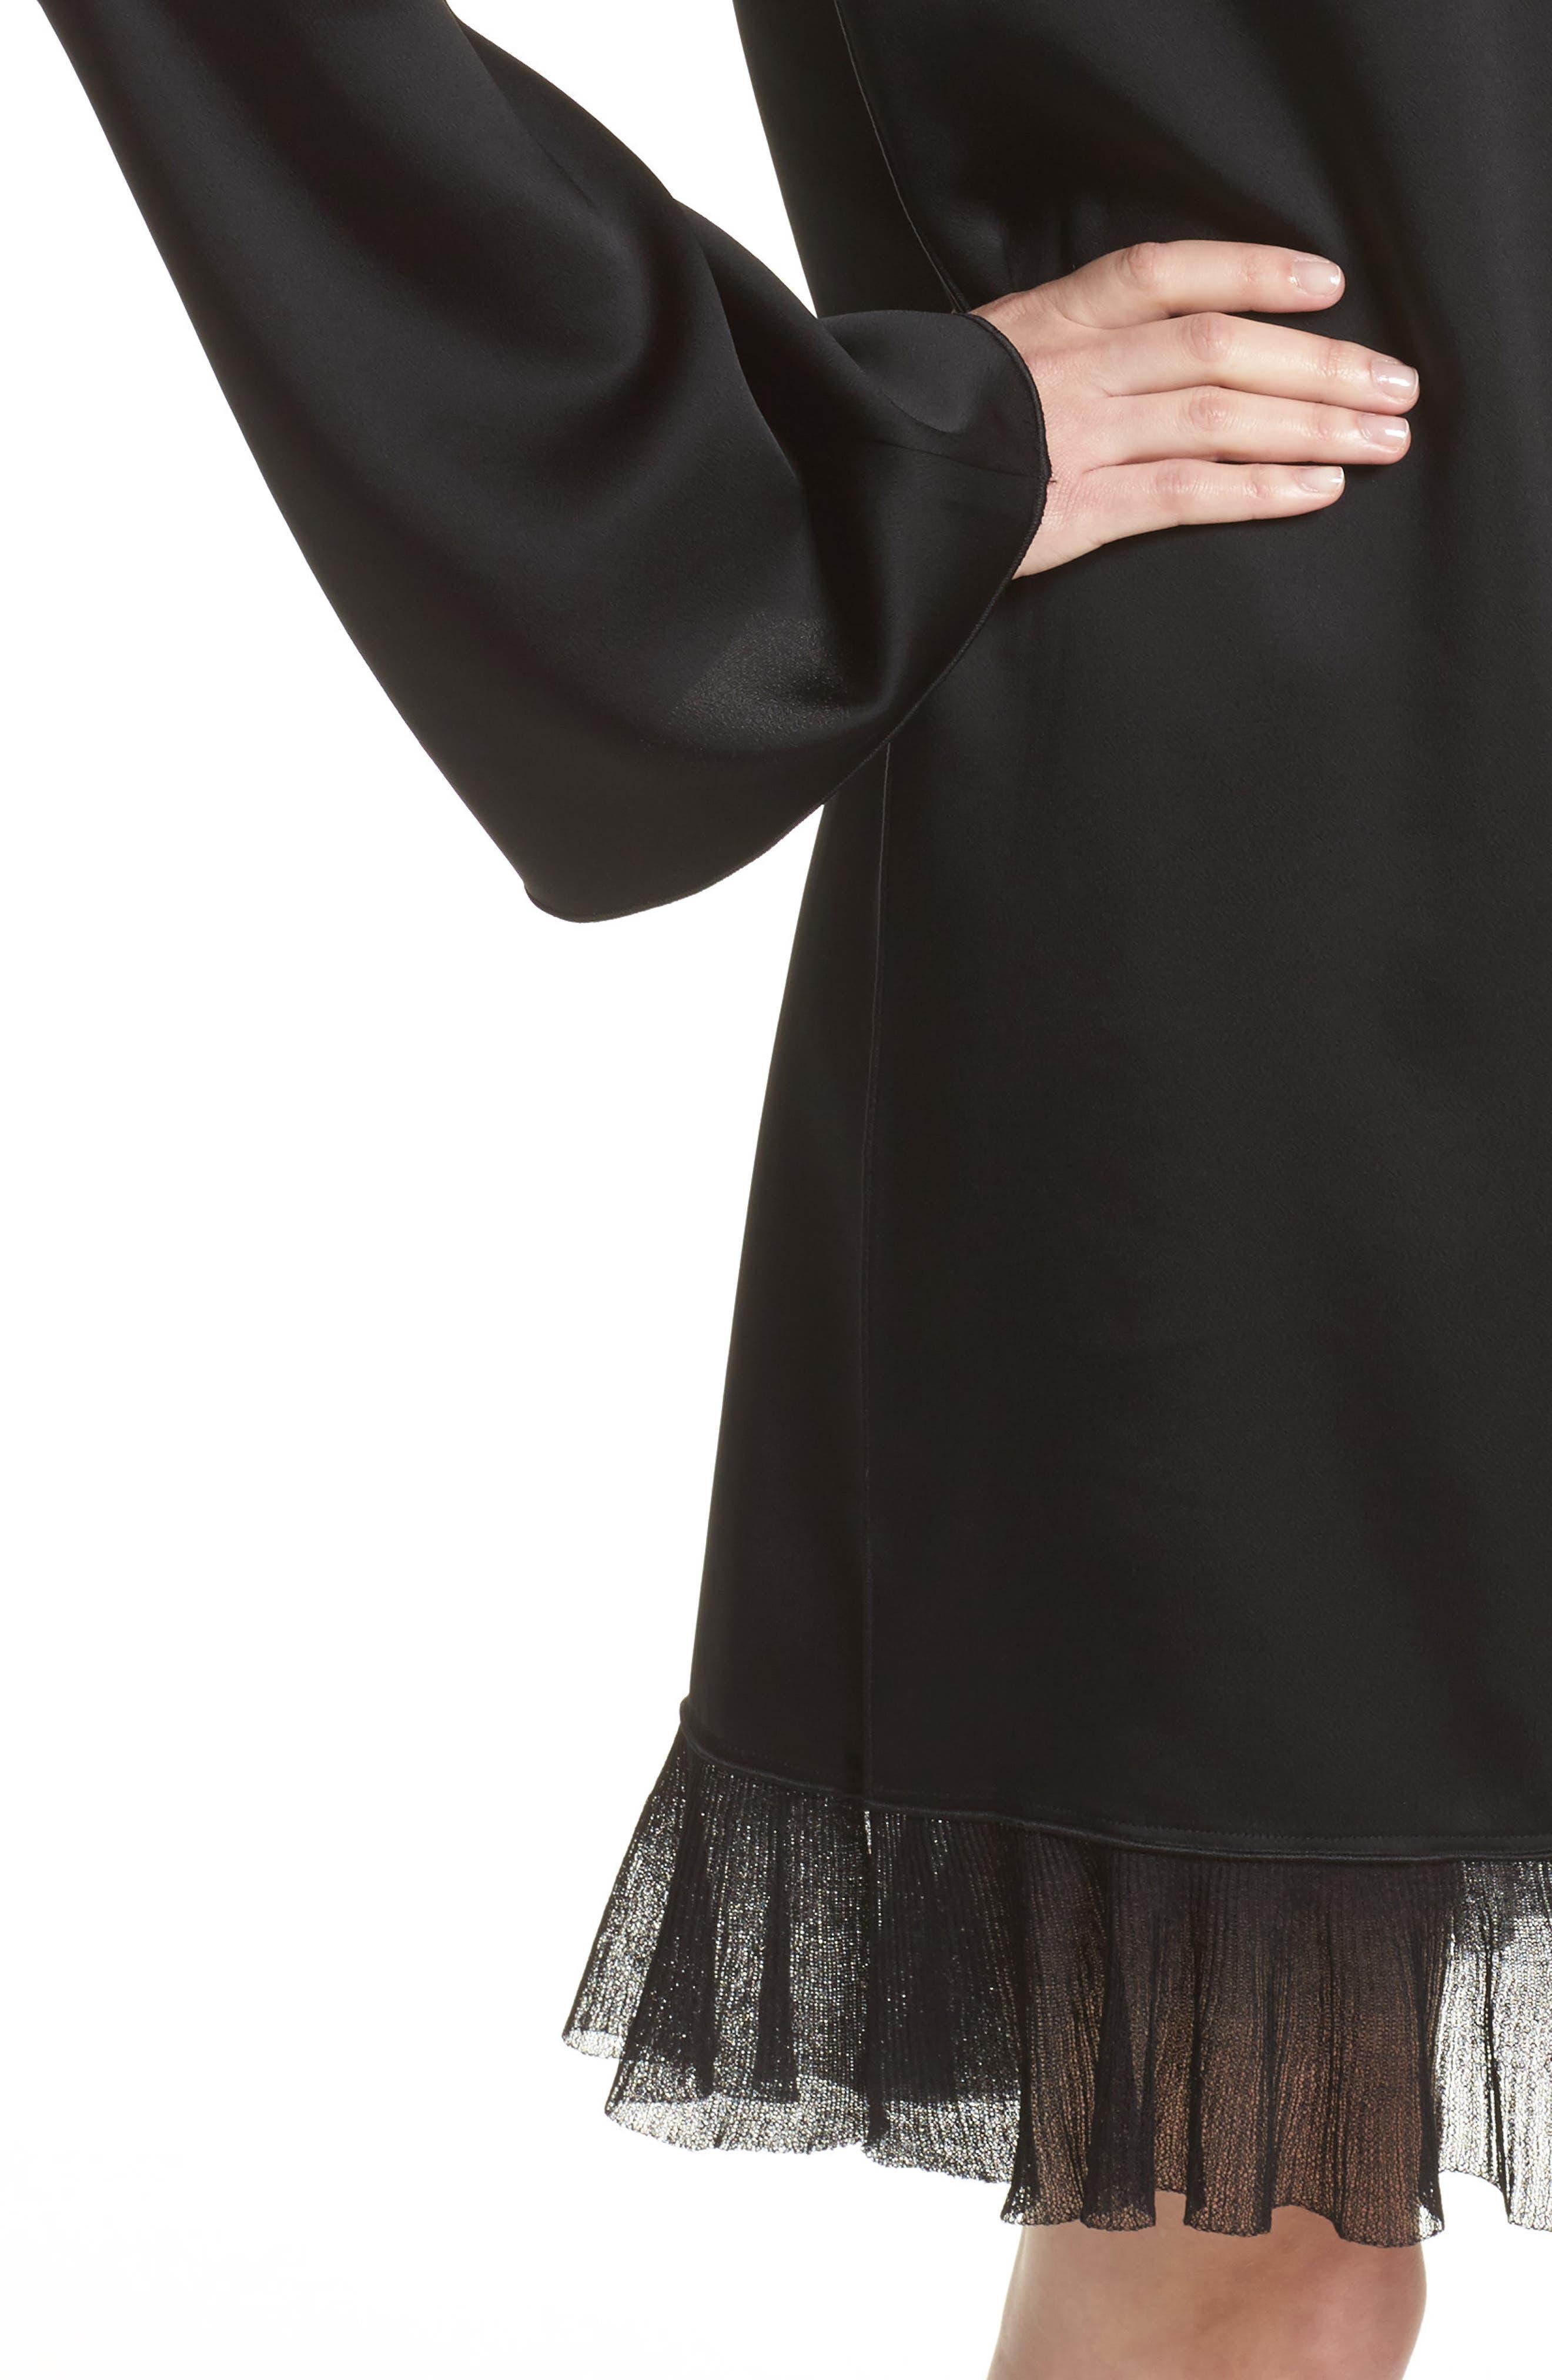 Heath Shift Dress,                             Alternate thumbnail 4, color,                             Black